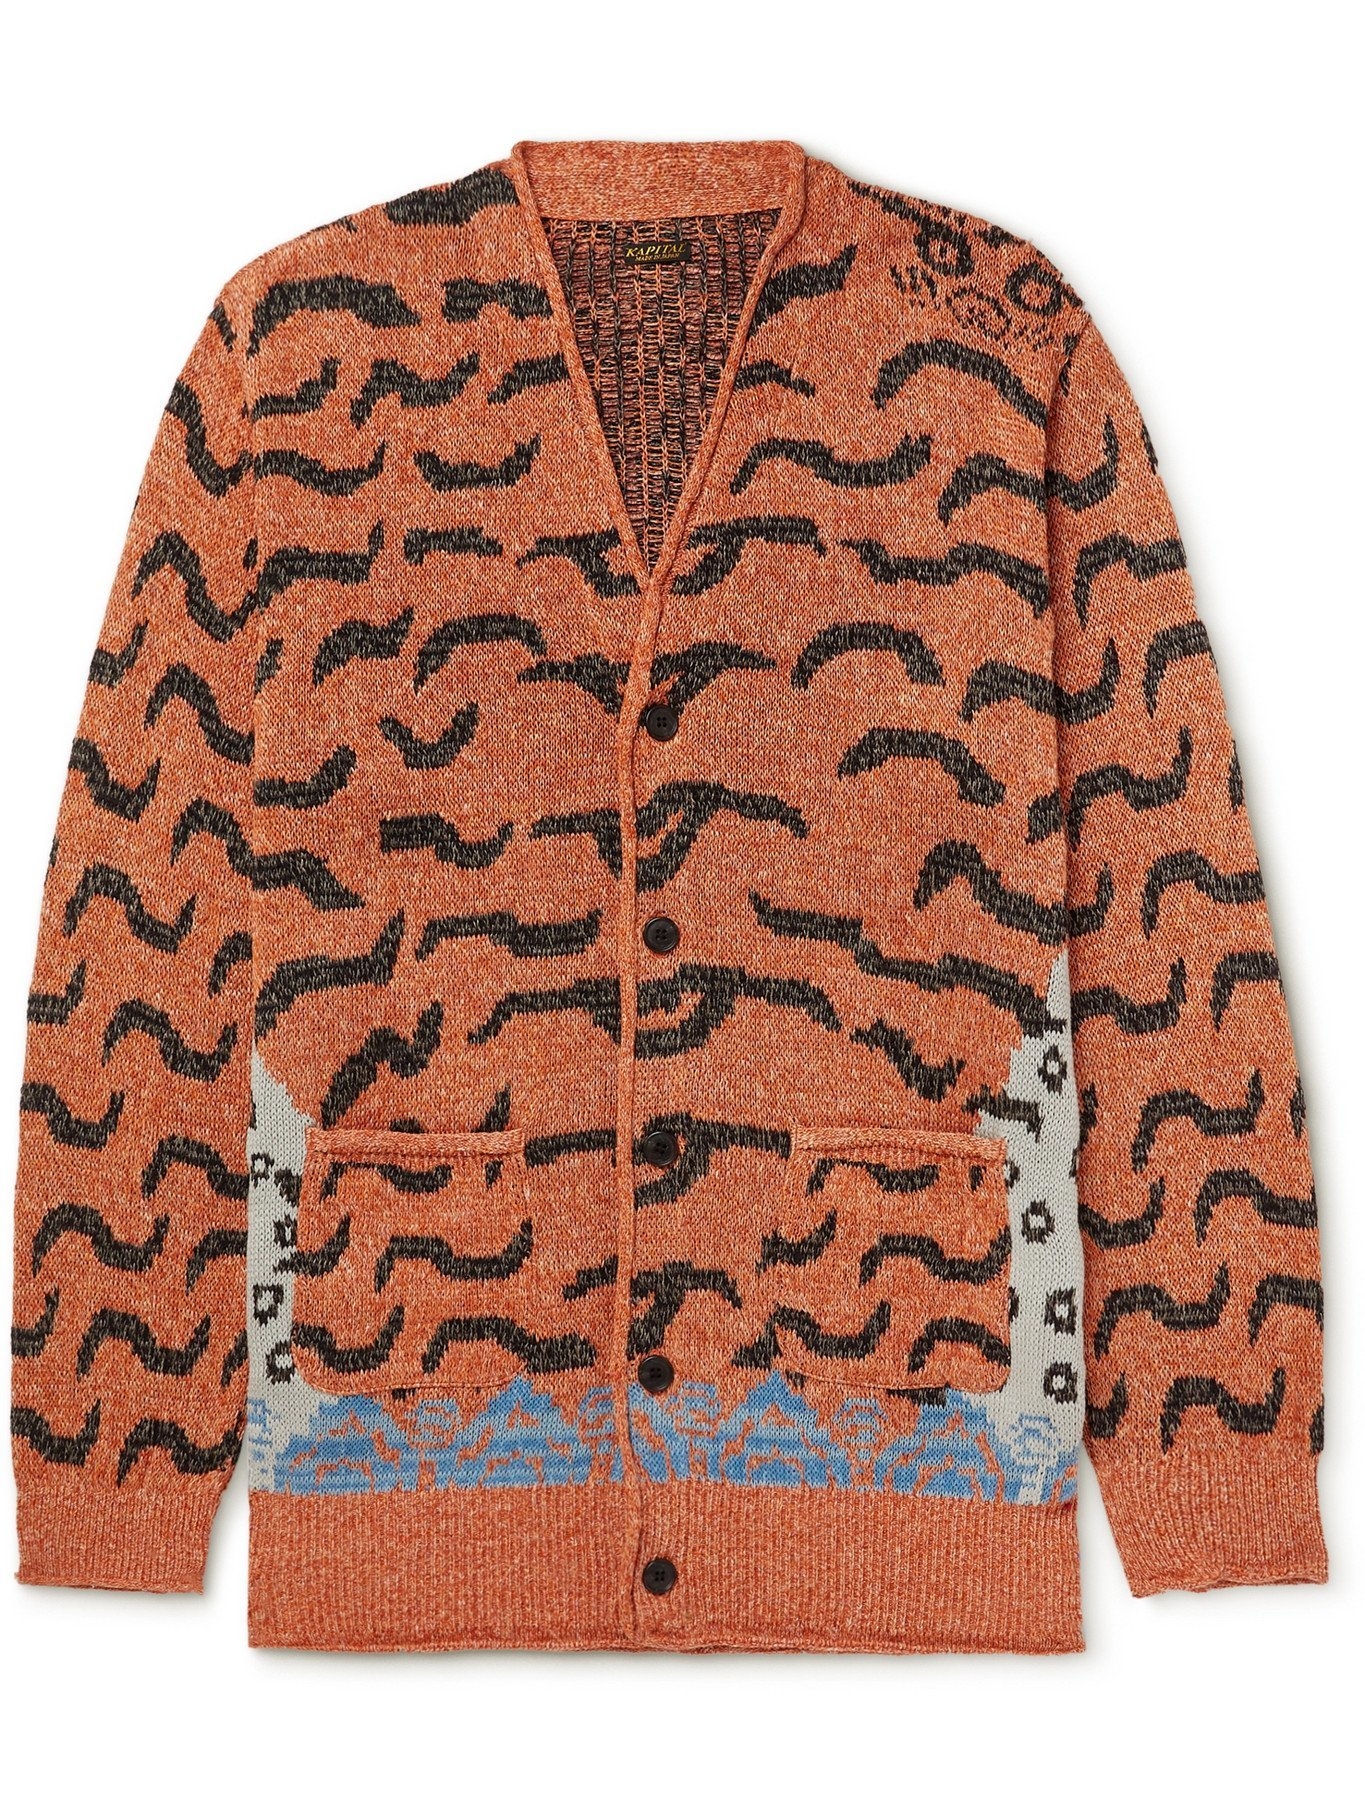 KAPITAL - Jacquard-Knit Cardigan - Orange - 3